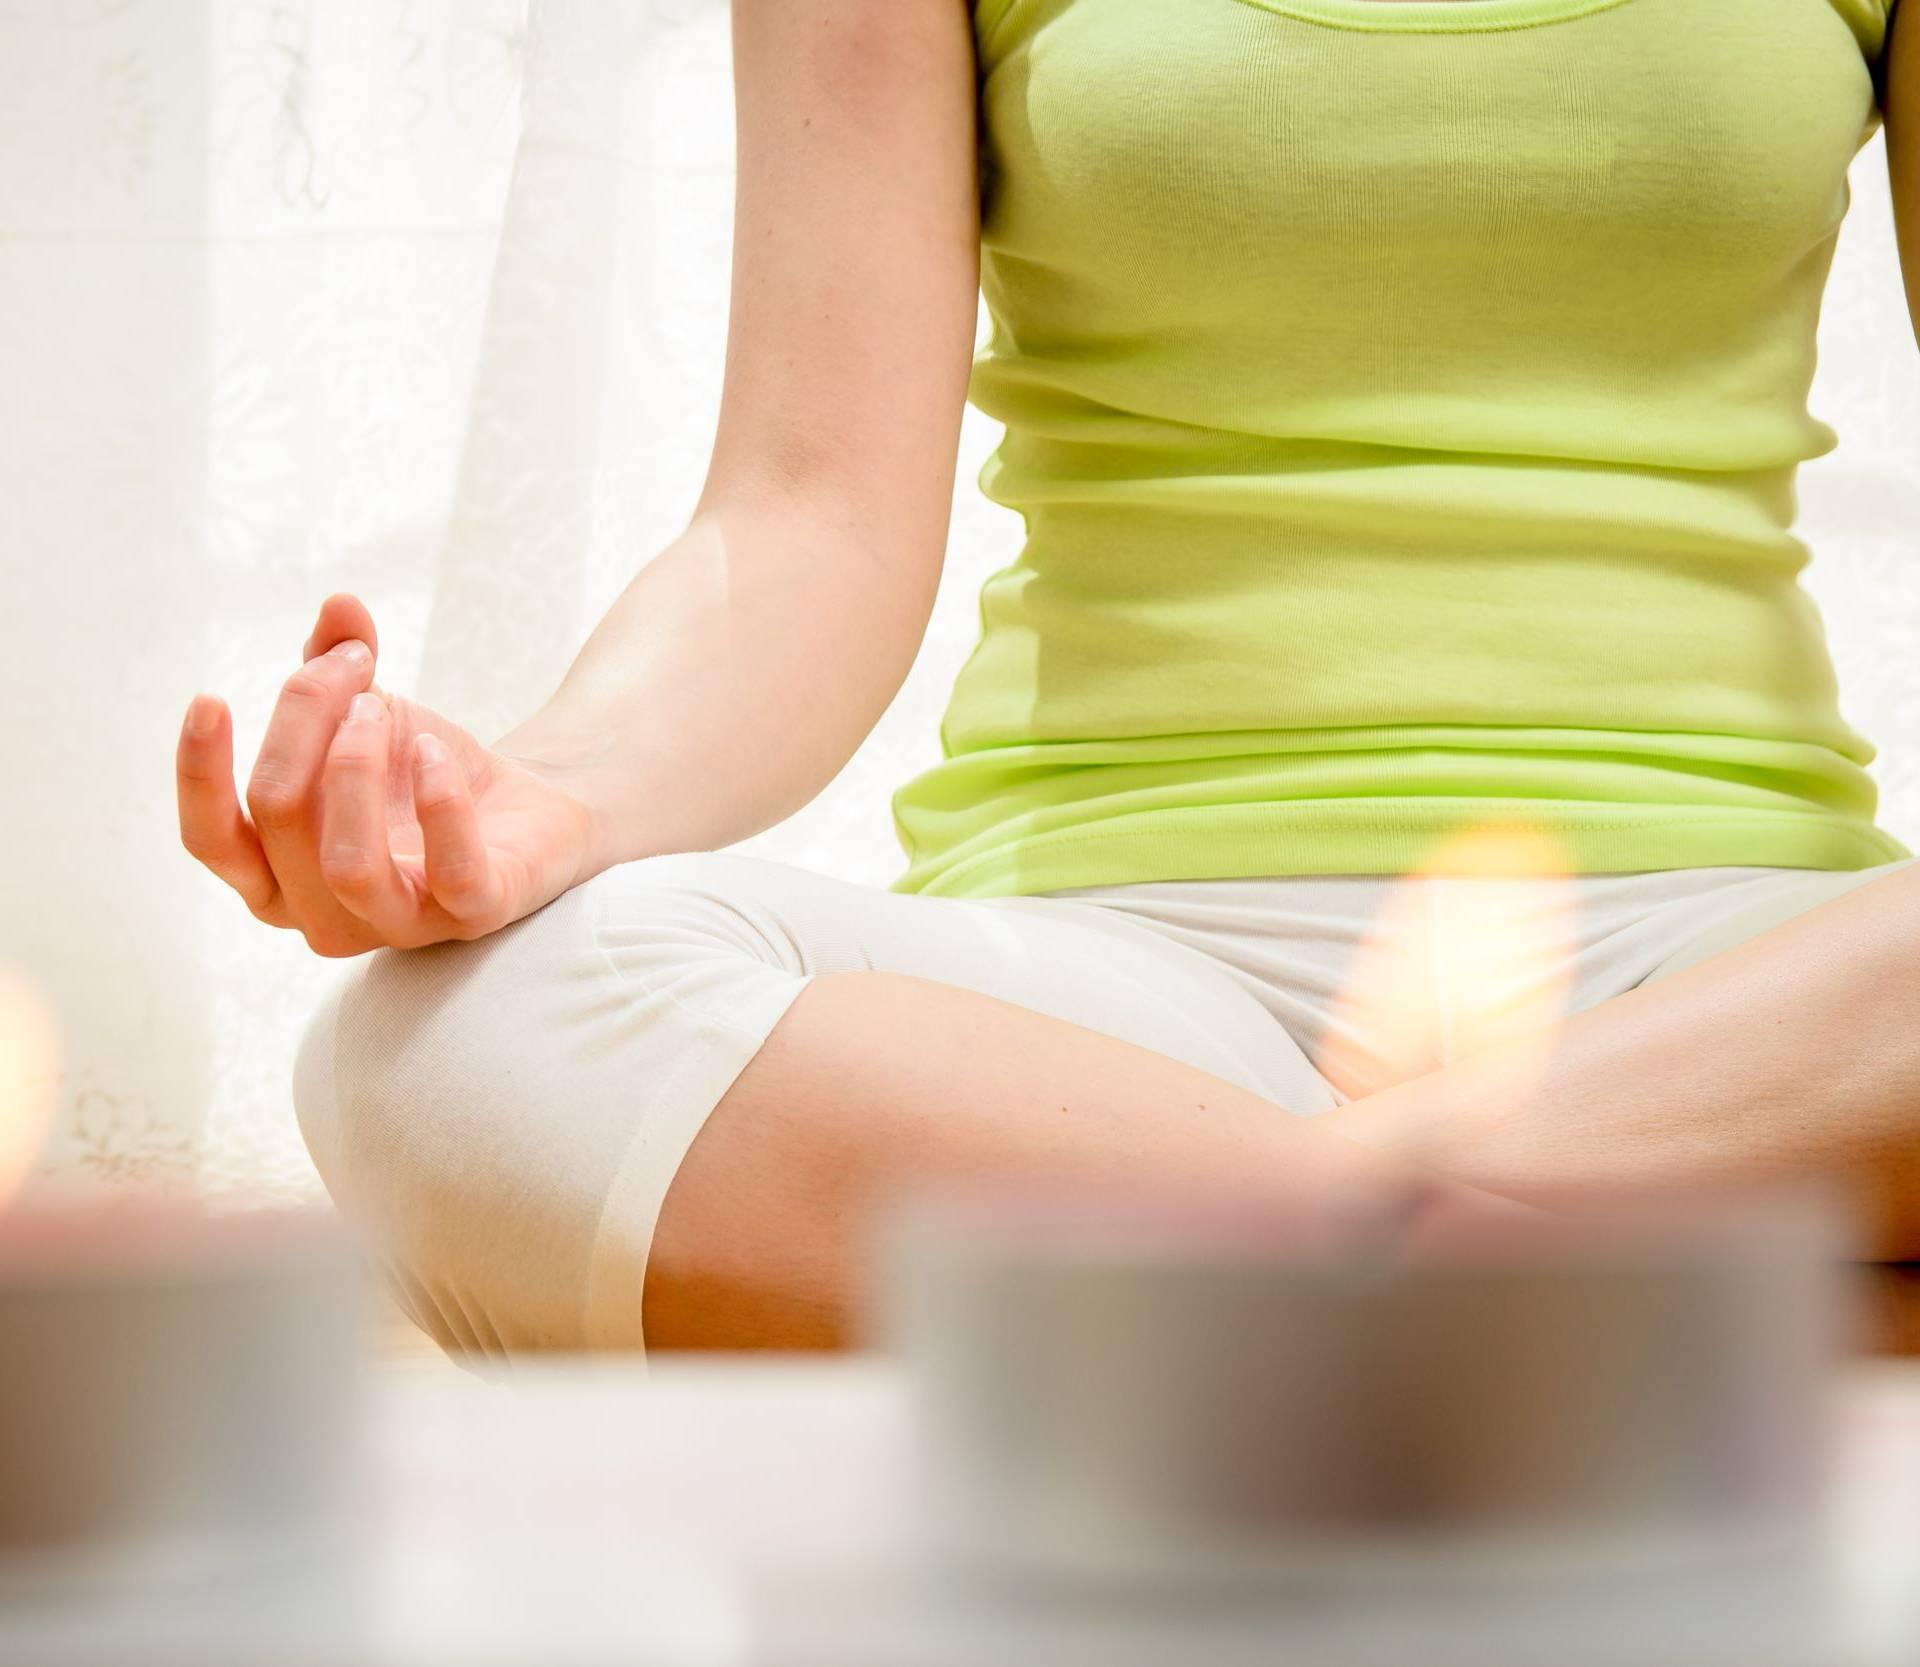 Meditirajte i zadajte si ciljeve da izbacite crne misli iz glave